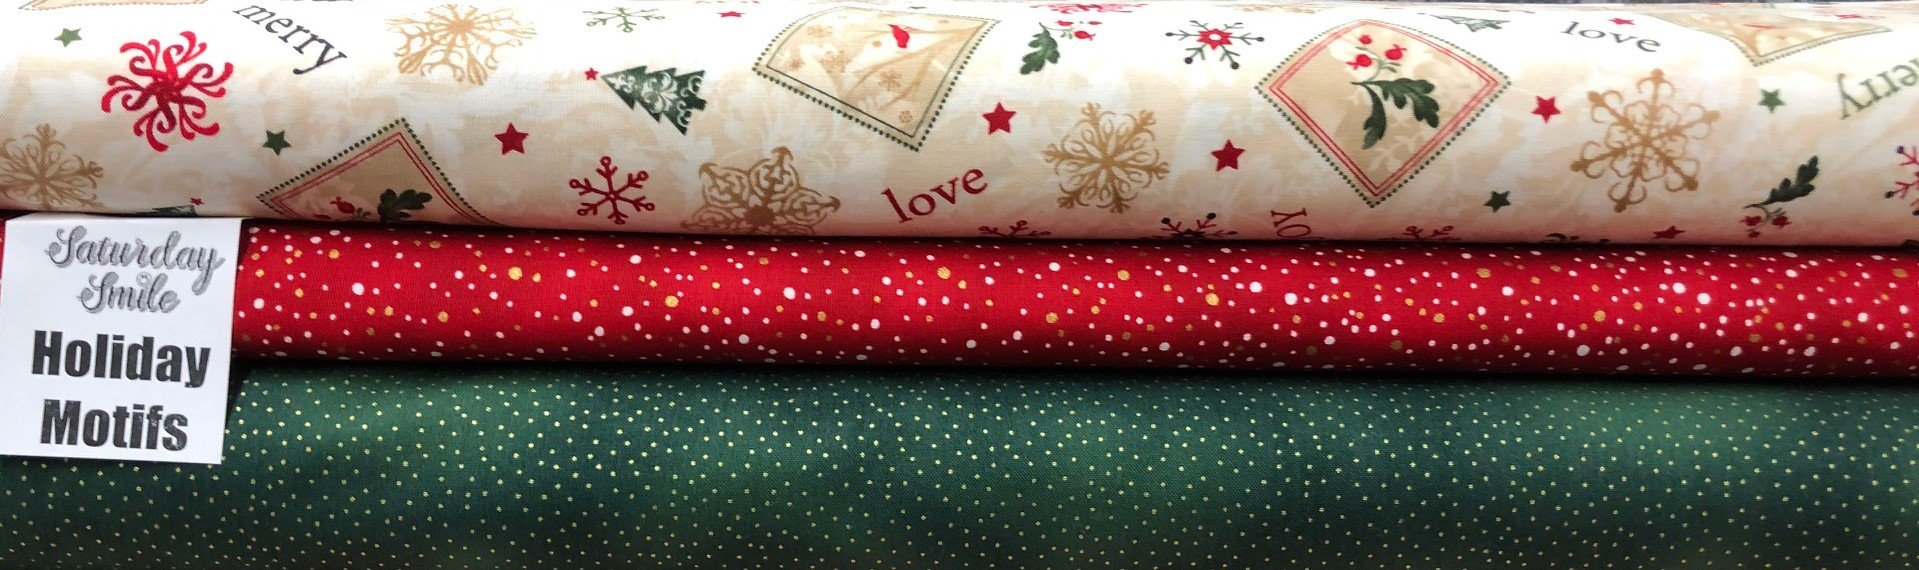 Holiday Motifs 3-Yard Kit